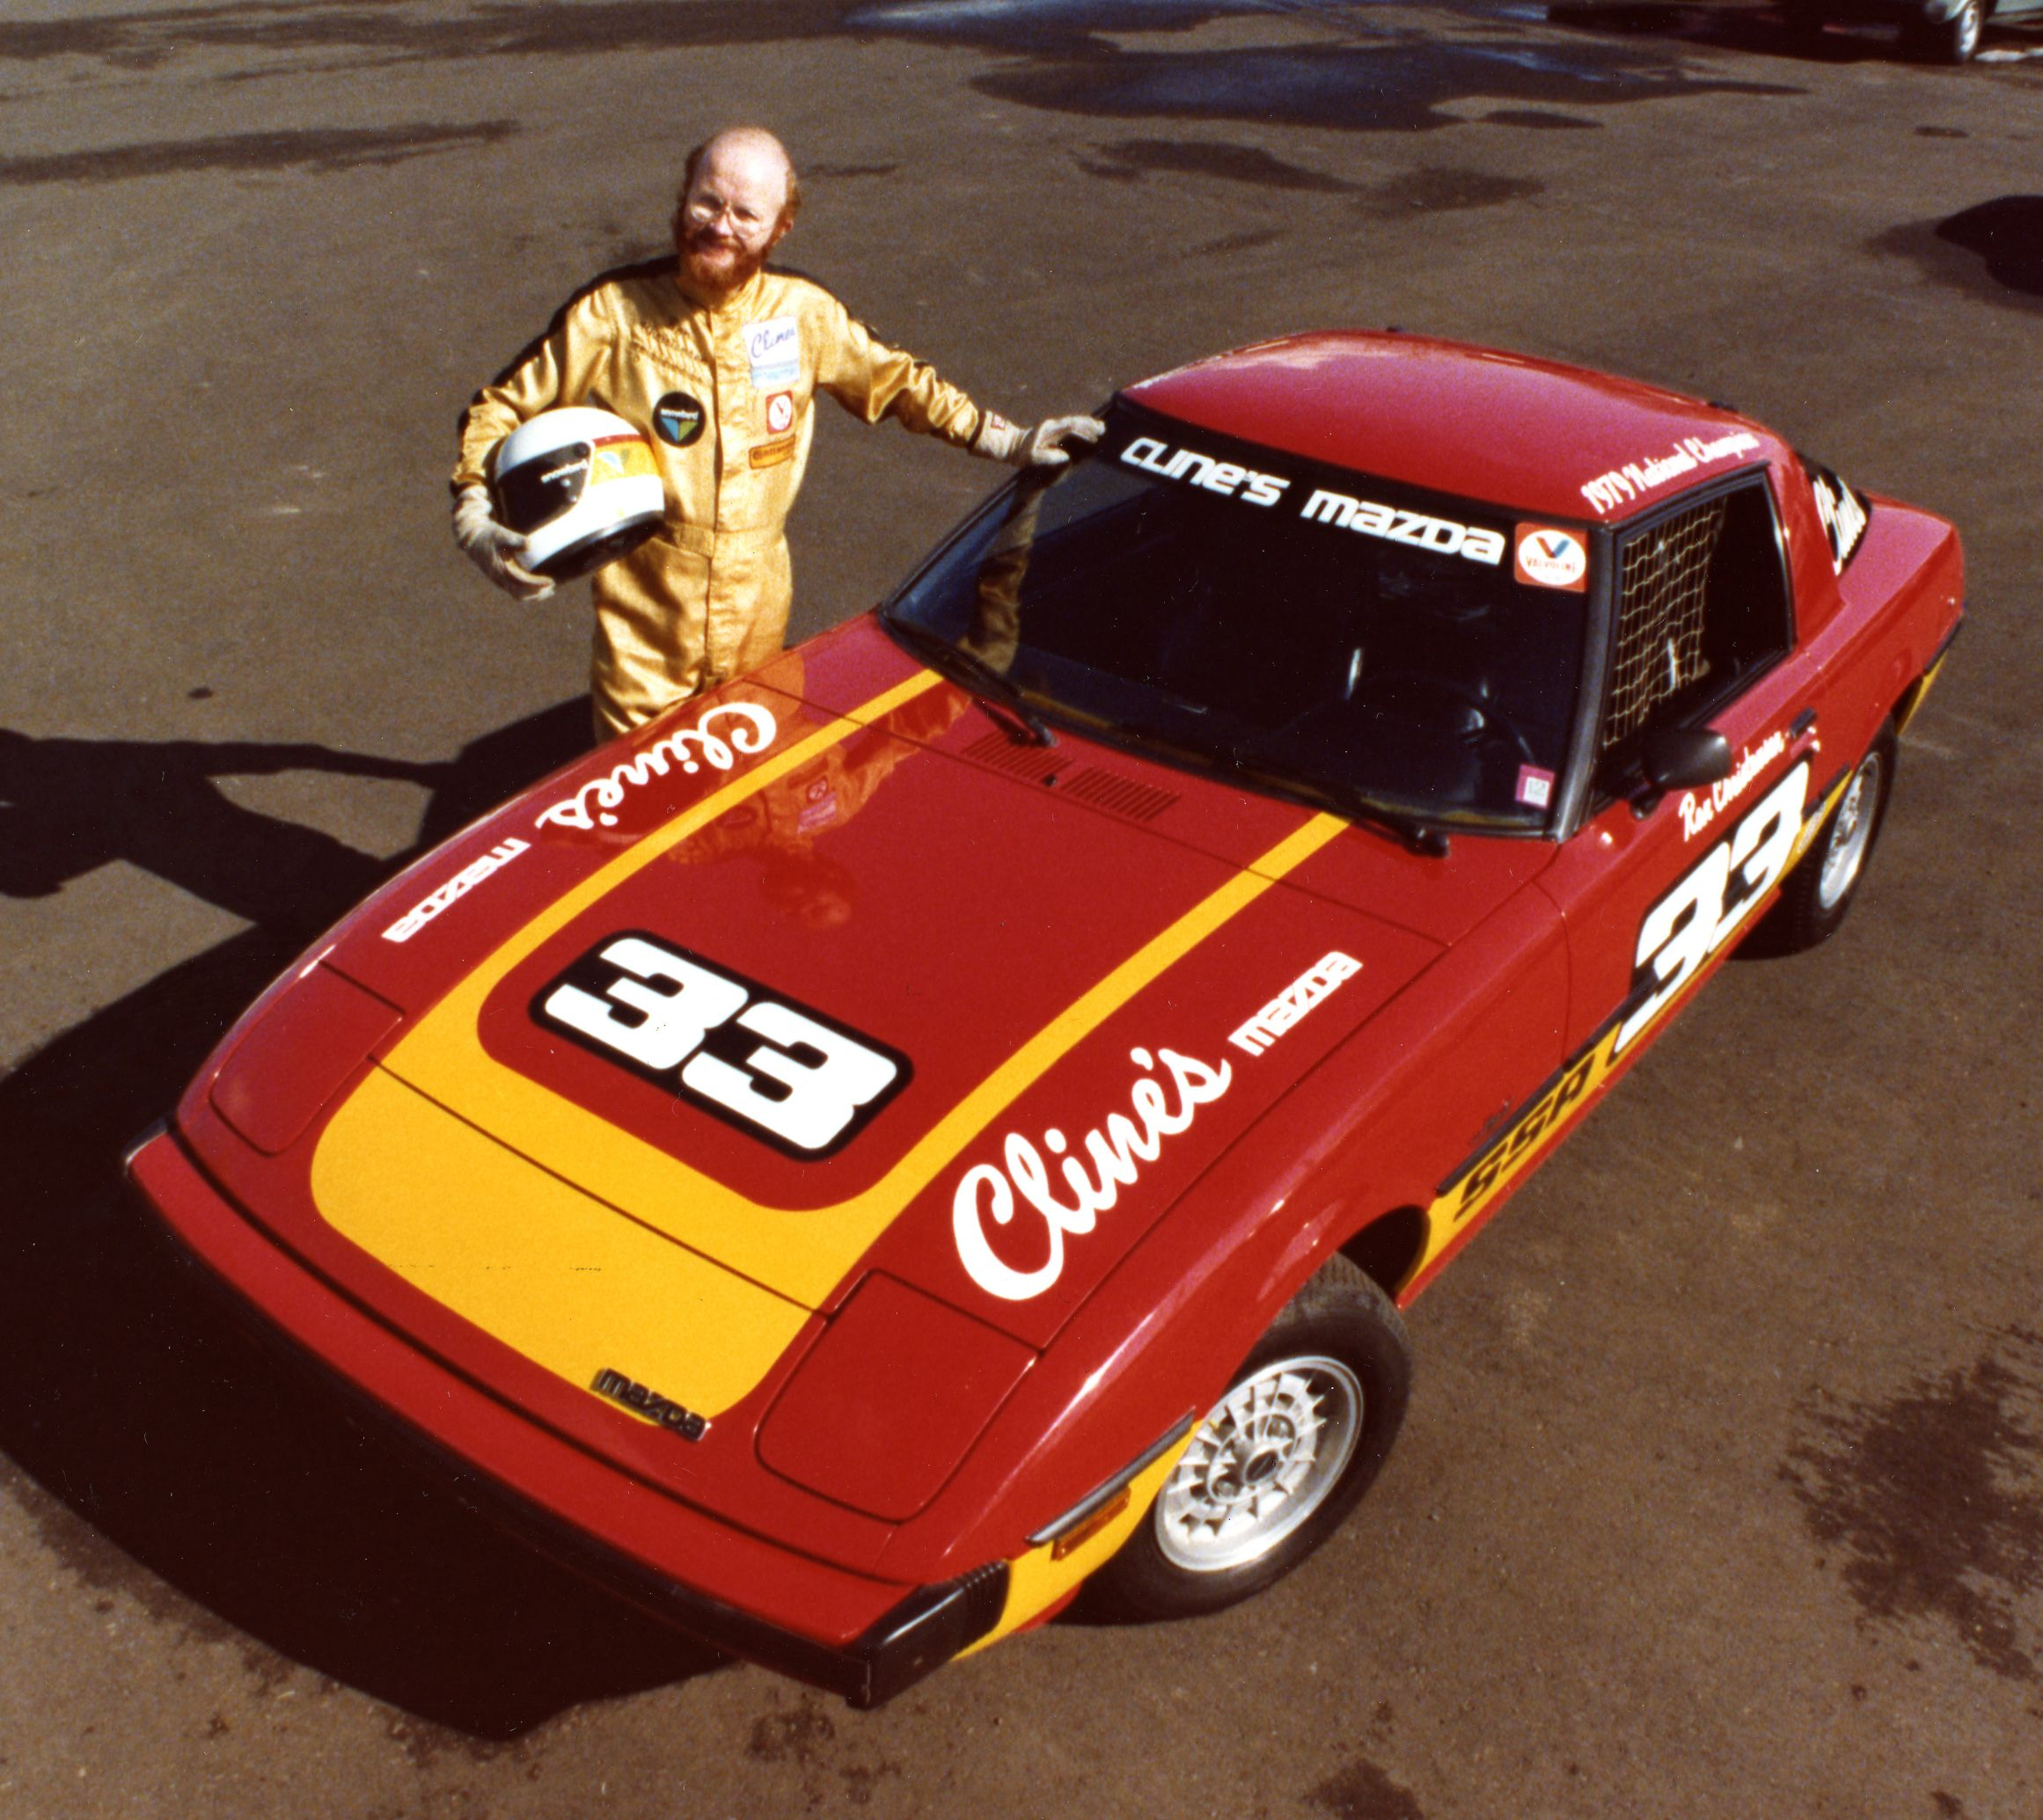 Car 56 14th race car 1980 mazda rx7 courtesy of cline